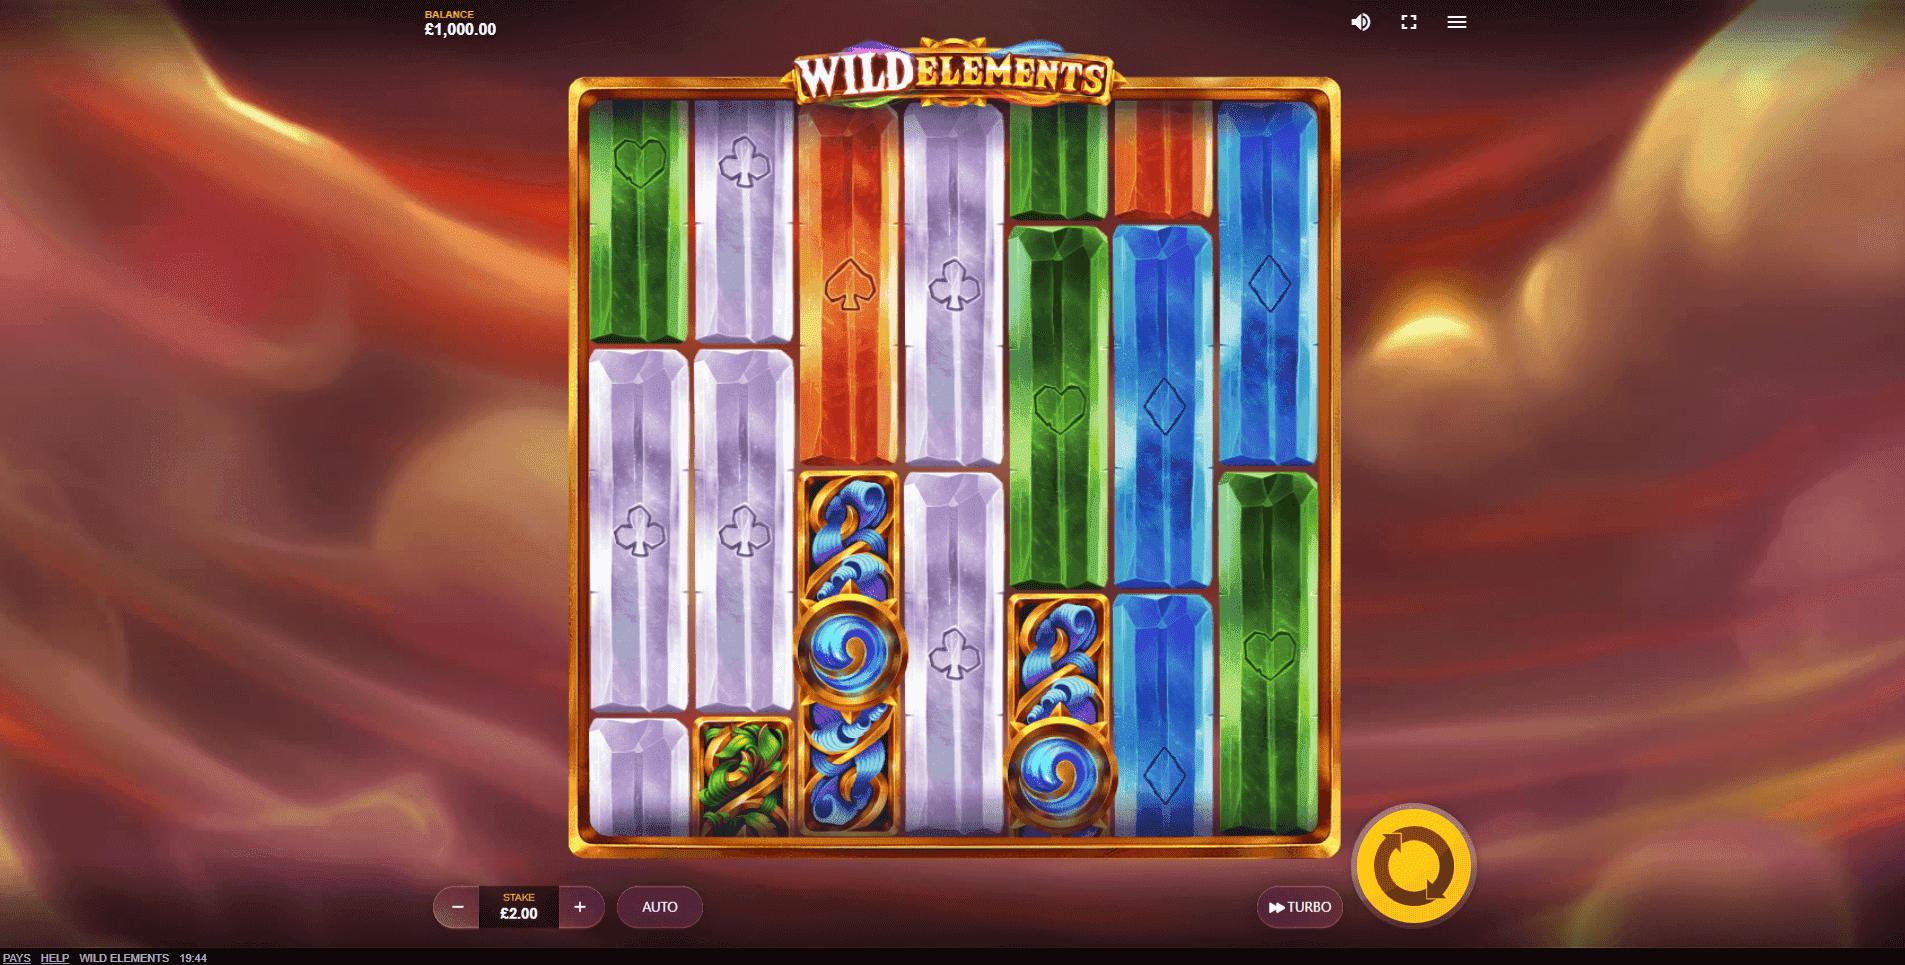 Wild Elements slot machine screenshot